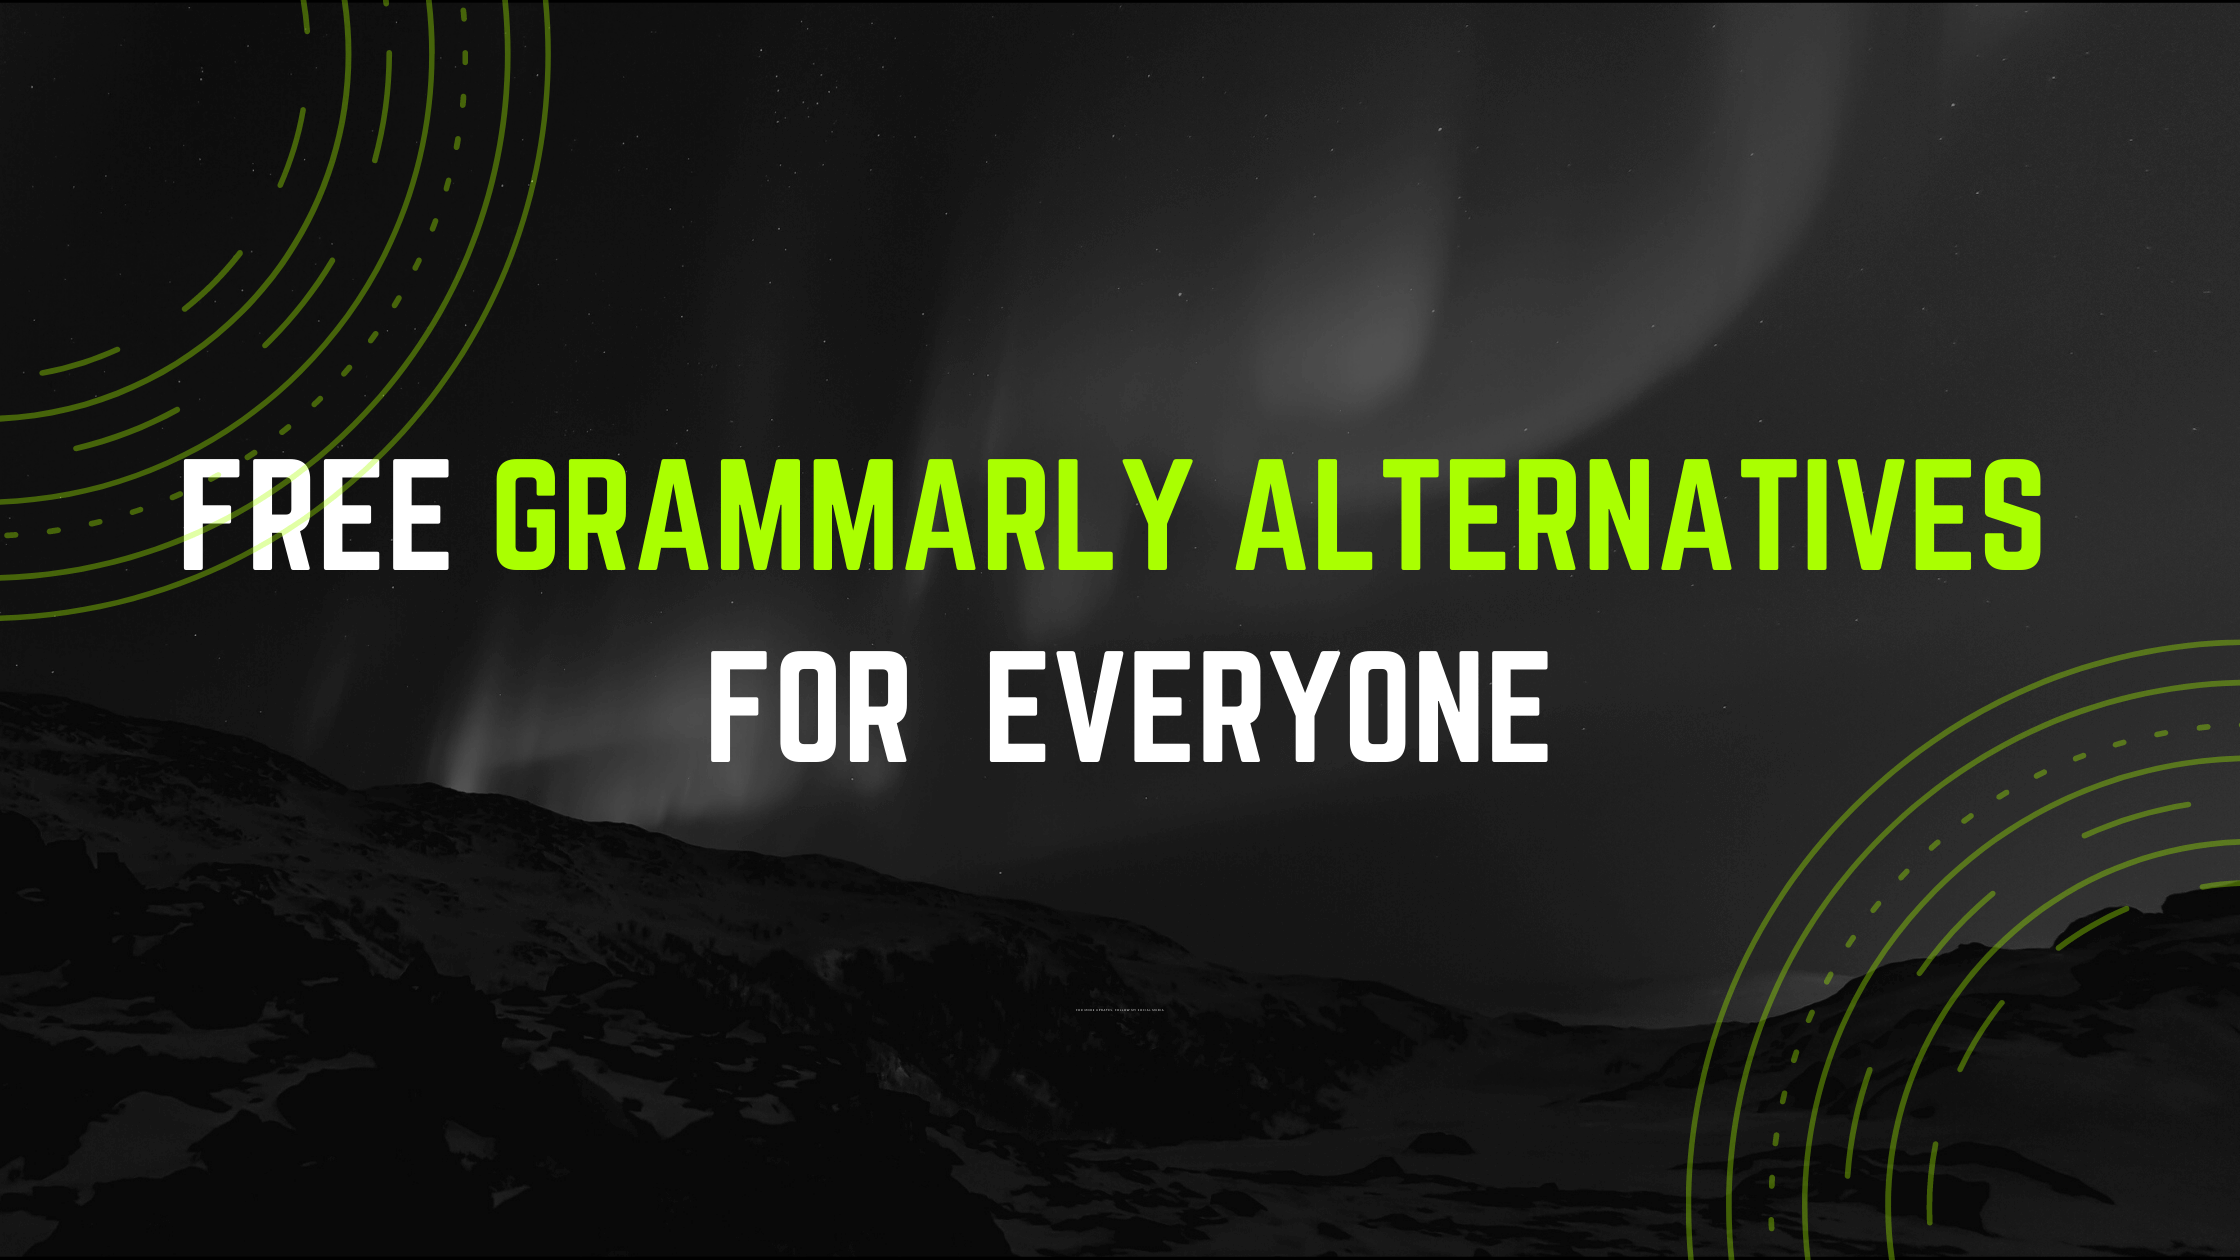 Free Grammarly Alternatives